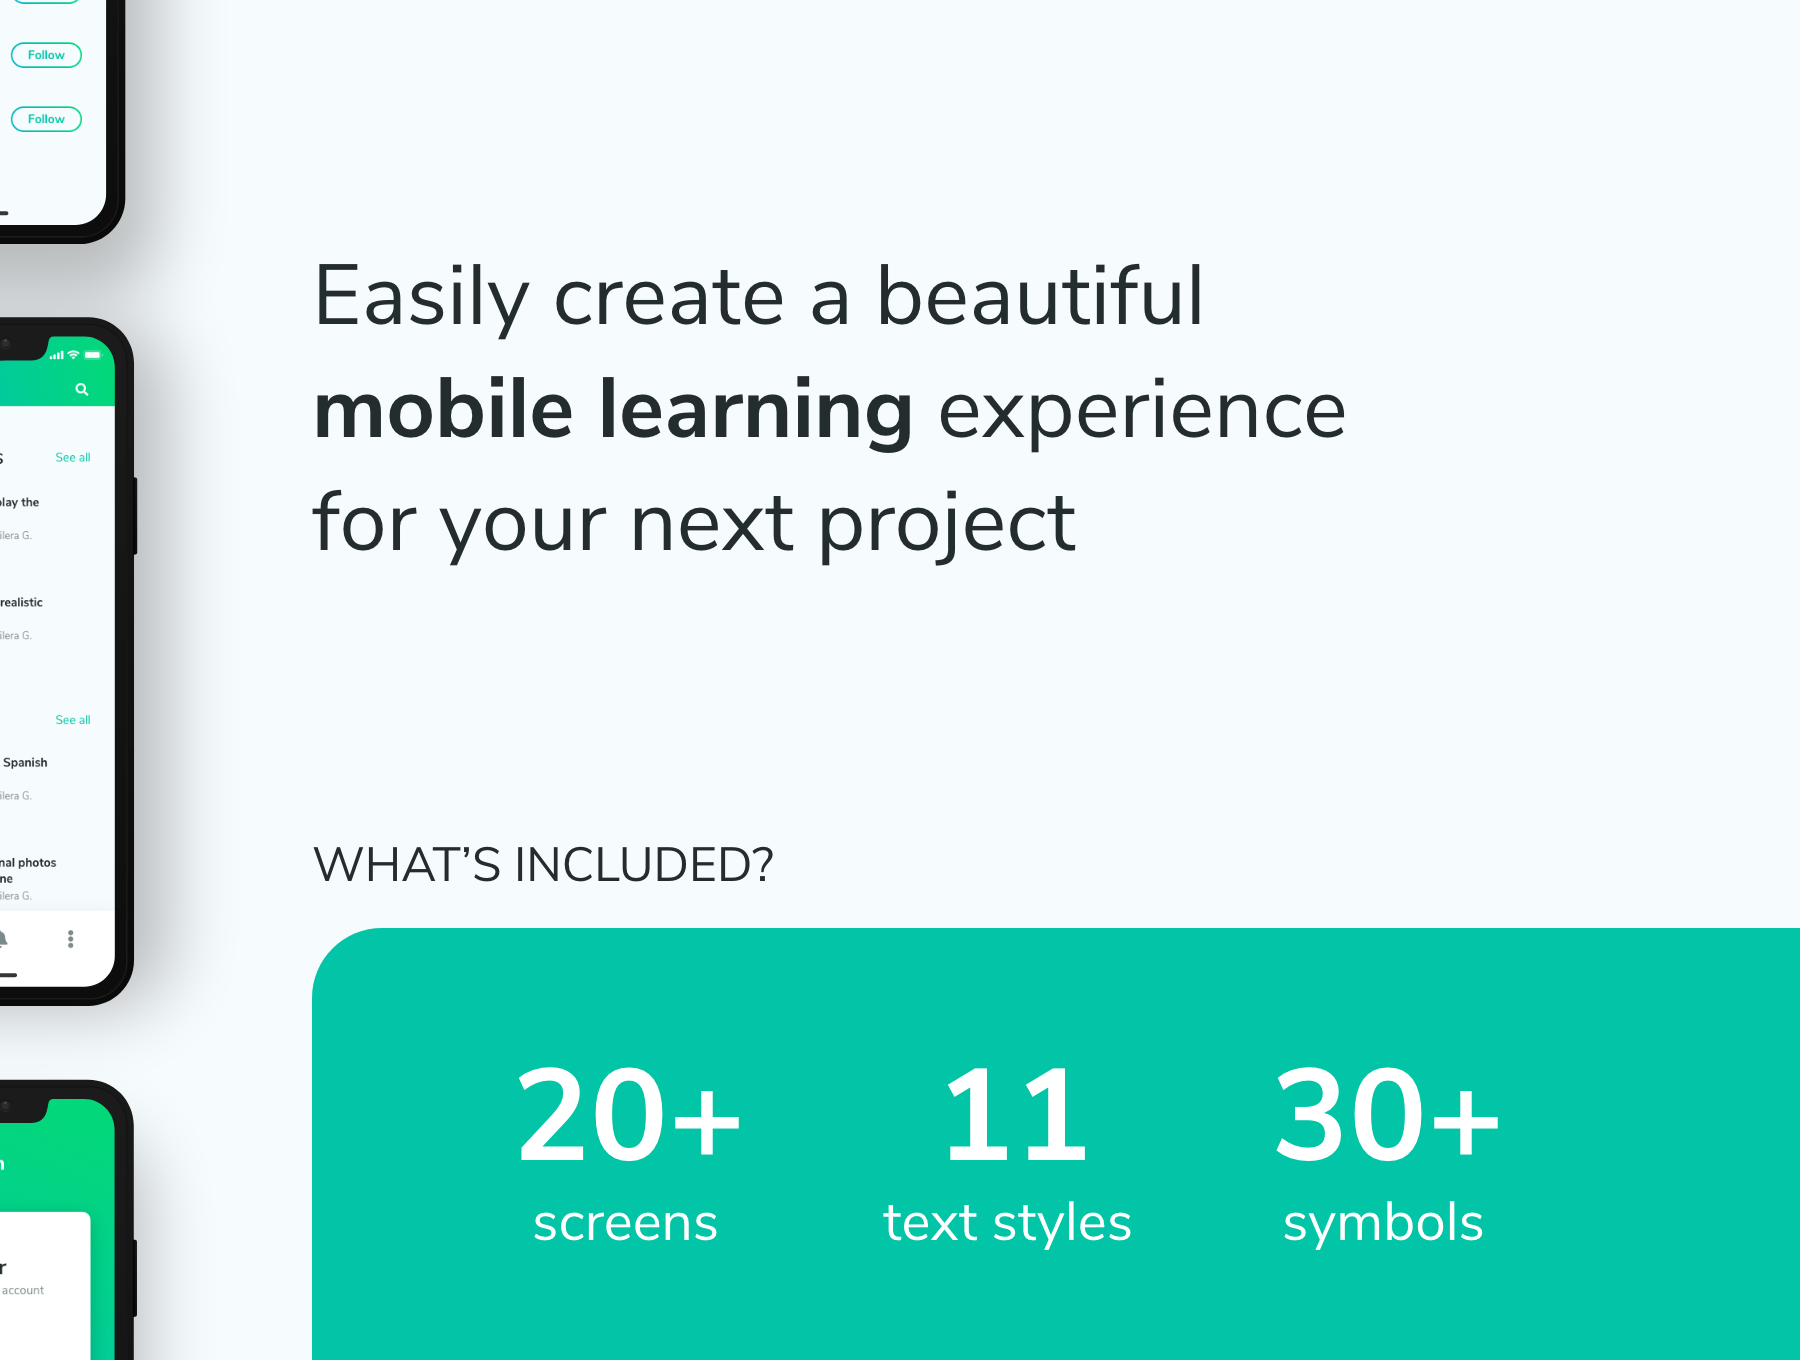 移动端在线学习 APP UI KIT app界面设计套装模板下载[XD] ProLearn - E-learning Mobile UI Kit